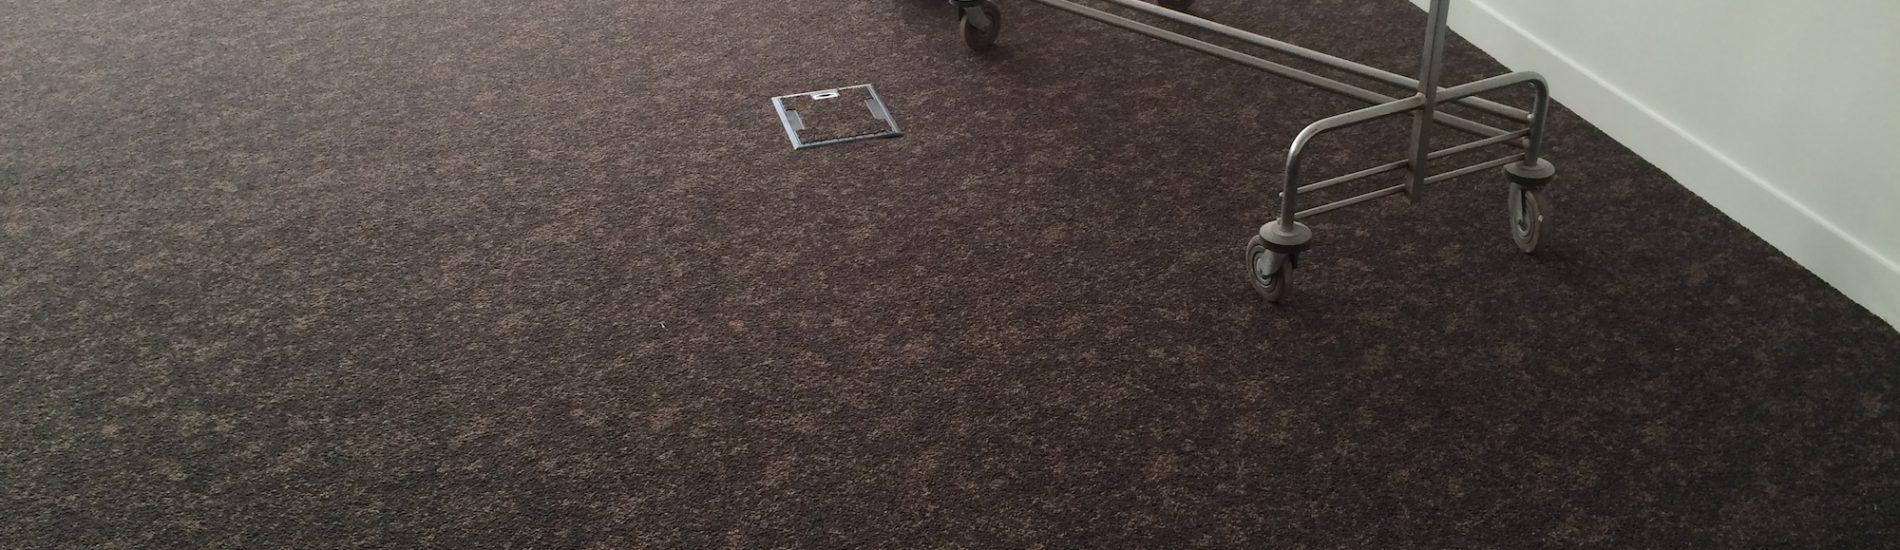 Entreprise nettoyage professionnel moquette, tapis - Nettoyage industriel Wonder Cleaner-bayonne